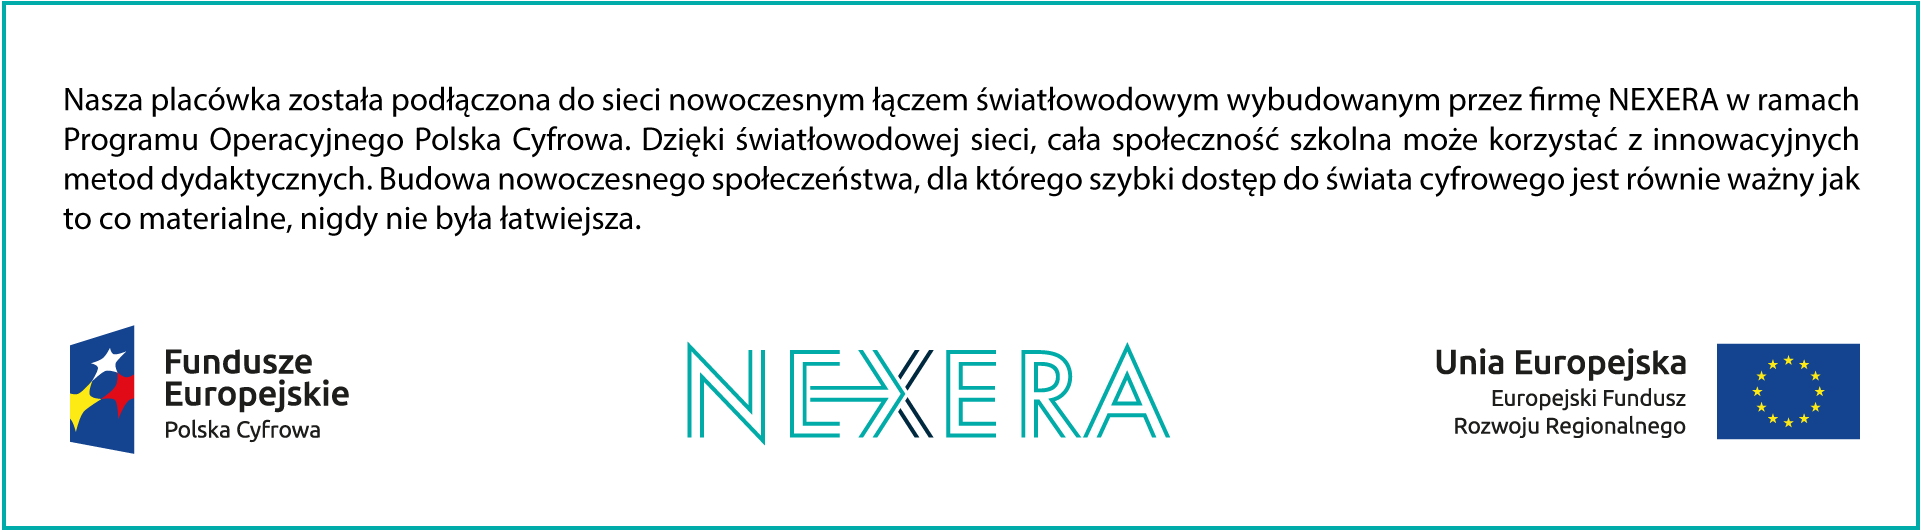 POPC2 Nexera